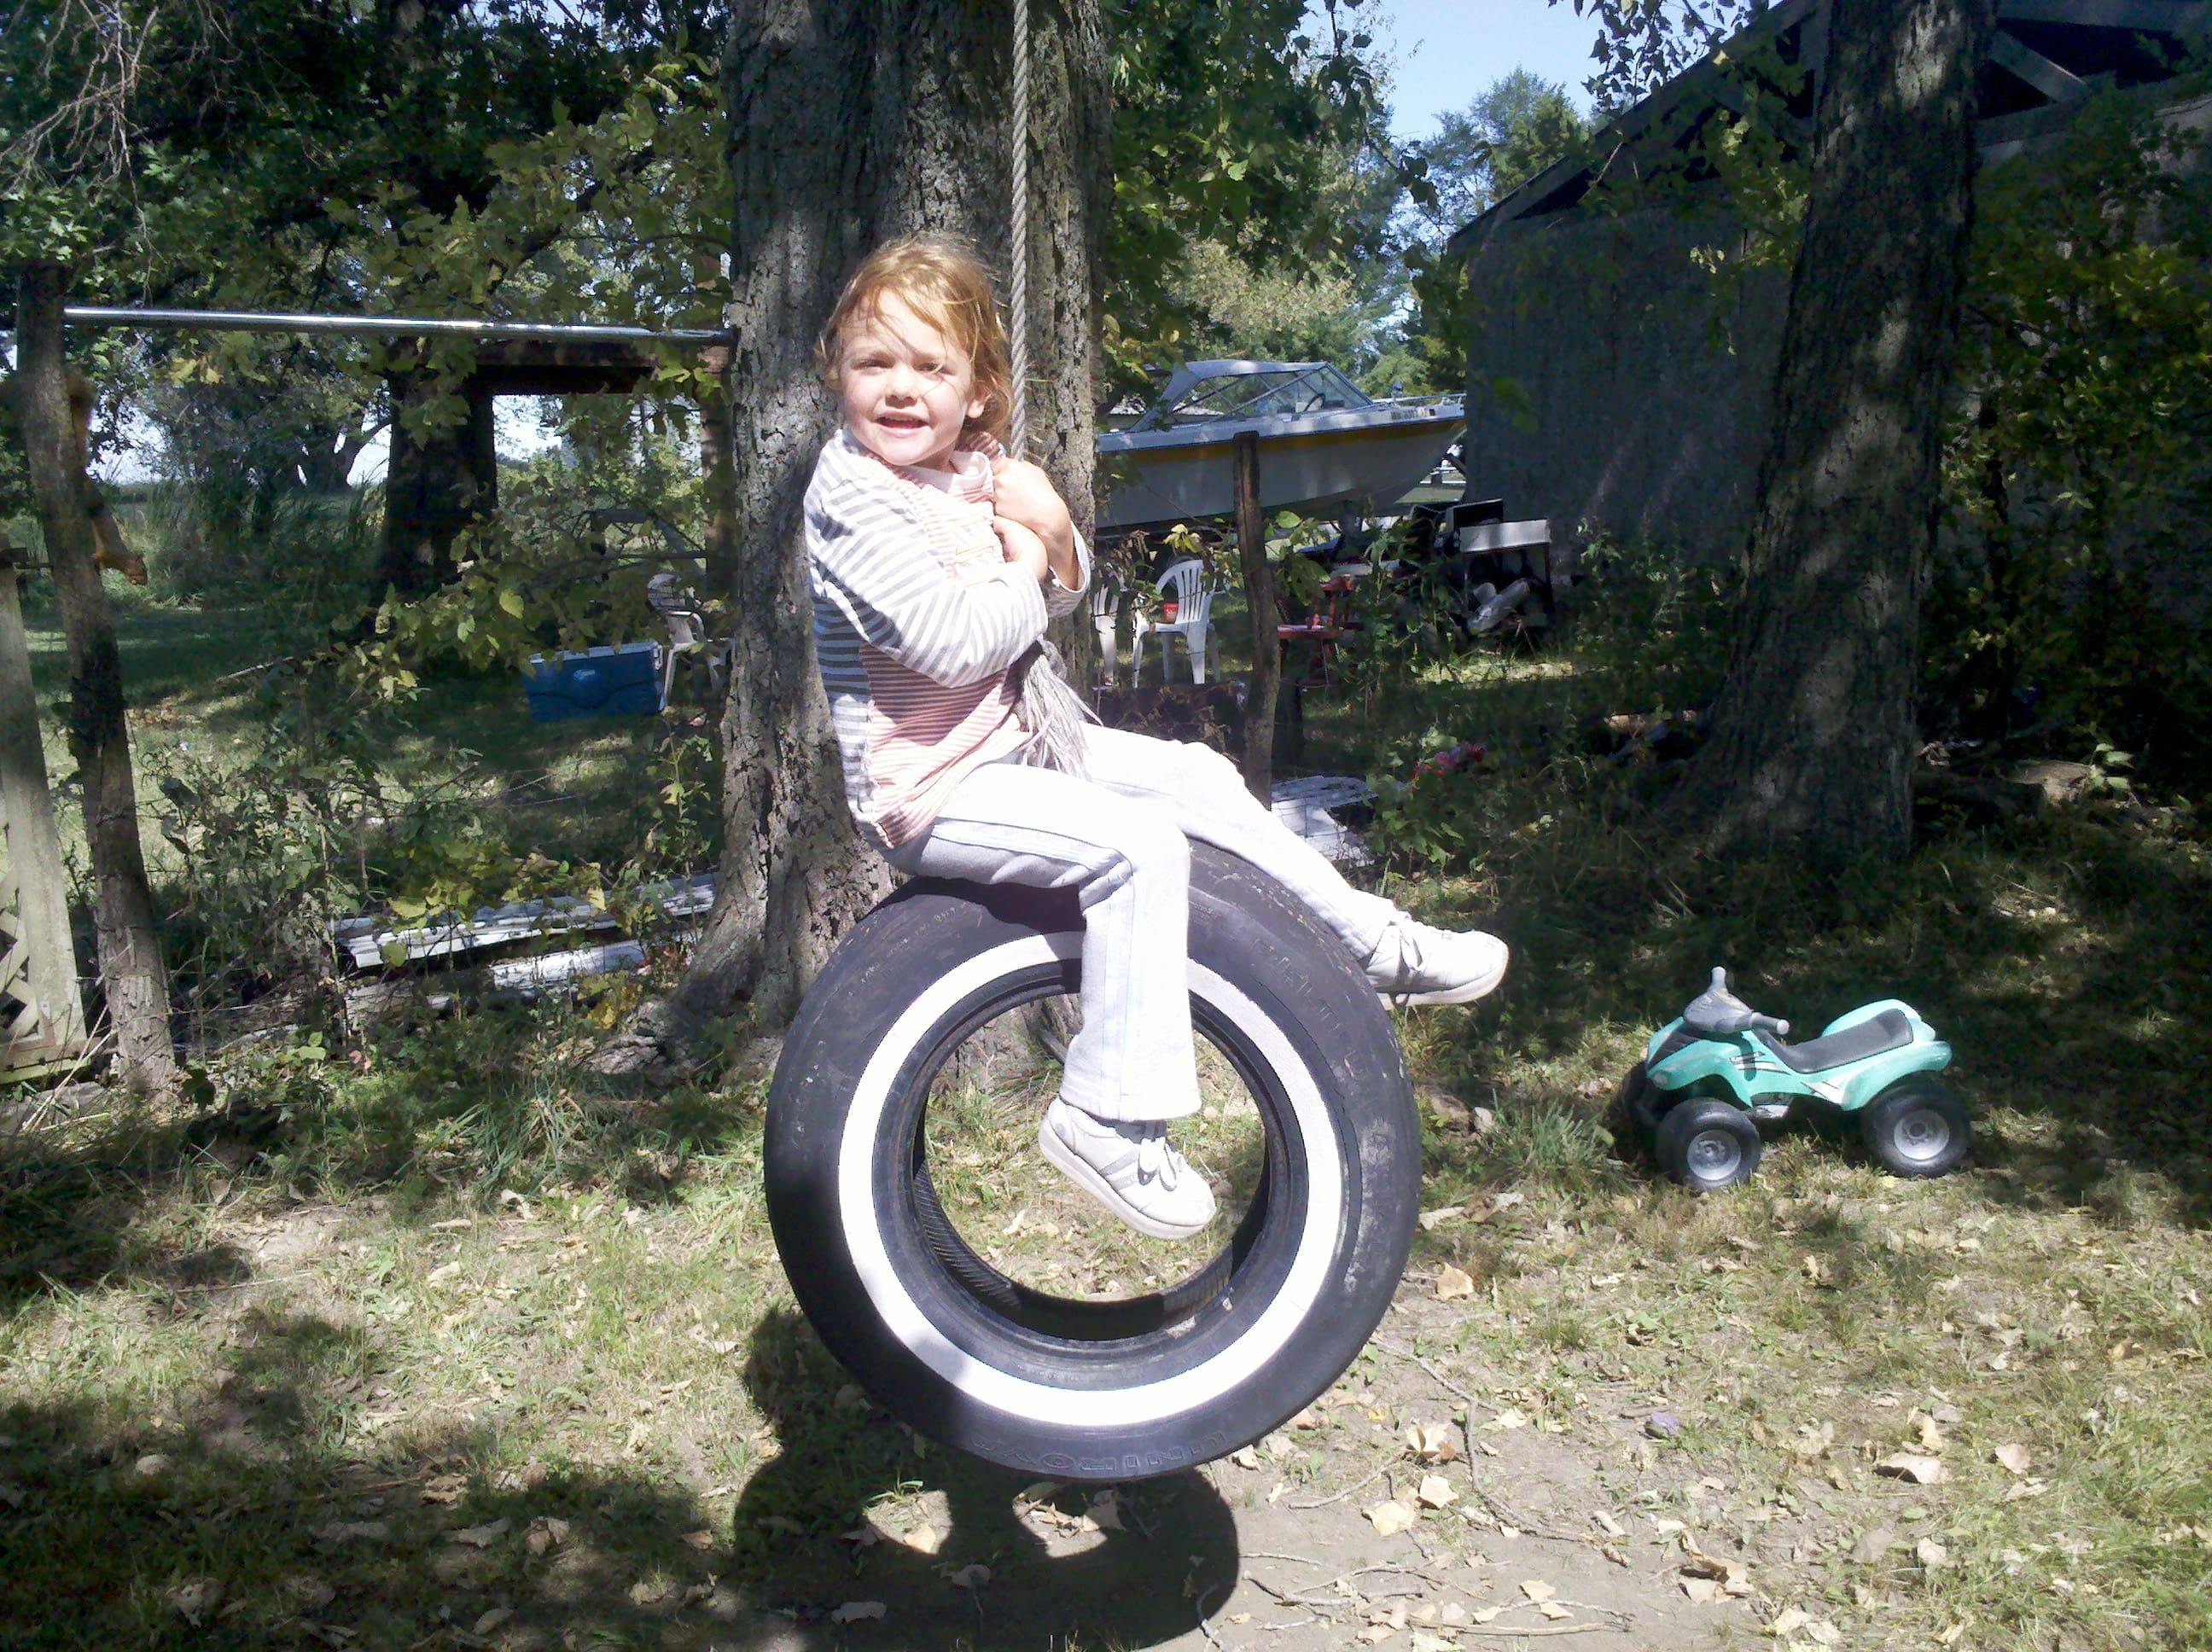 https://0201.nccdn.net/4_2/000/000/076/de9/tire-swing-fall-2011--5--min-2592x1936.jpg